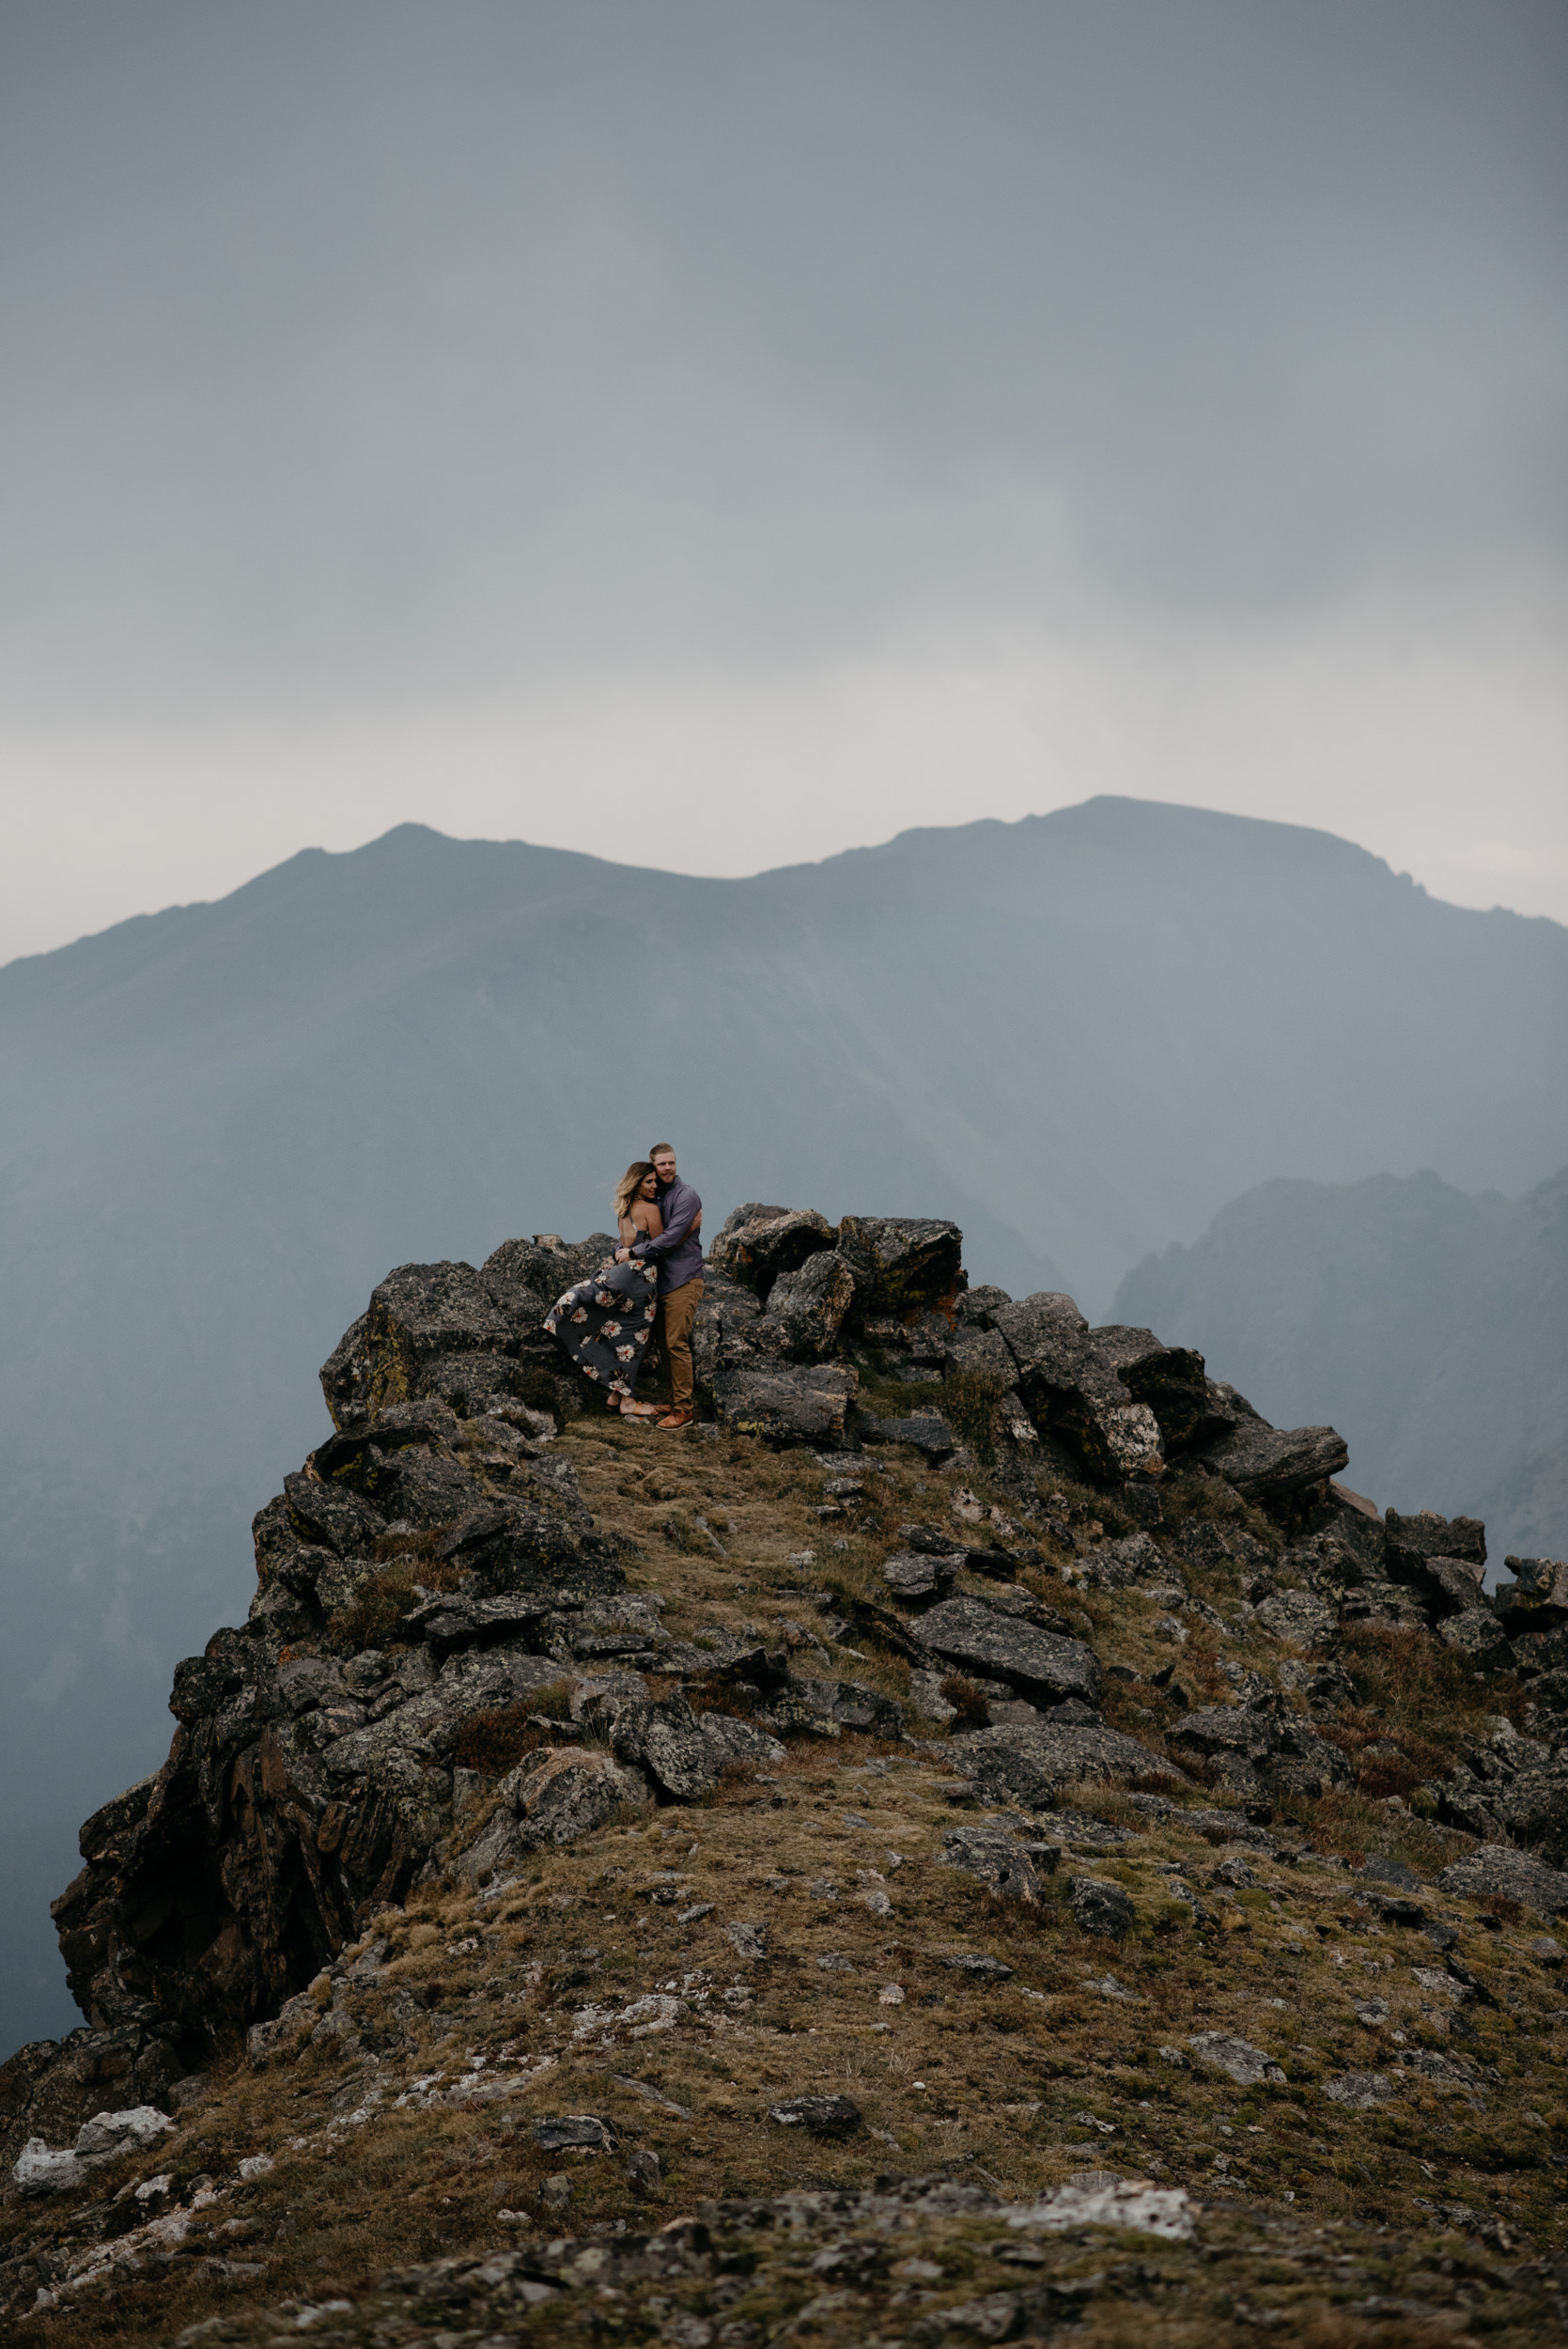 Colorado adventure elopement photographer, Alyssa Reinhold. Adventure engagement session in Rocky Mountain National Park.